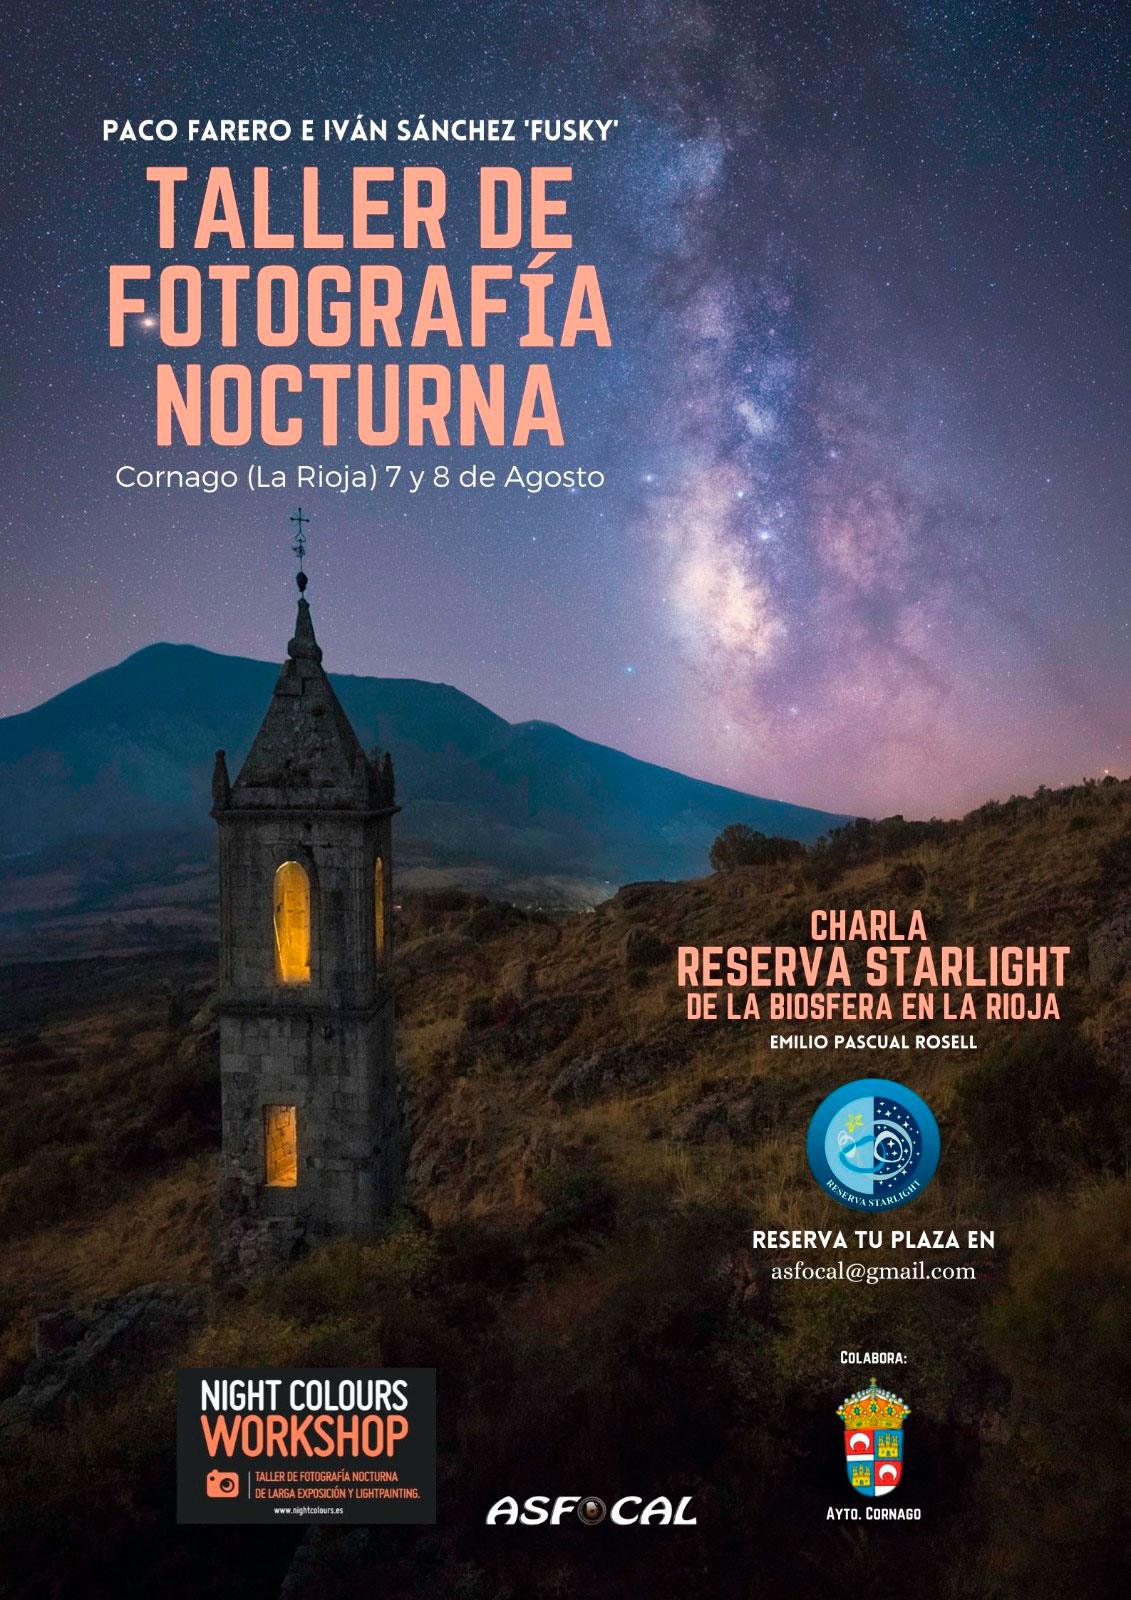 Taller de fotografía nocturna (7 agosto)